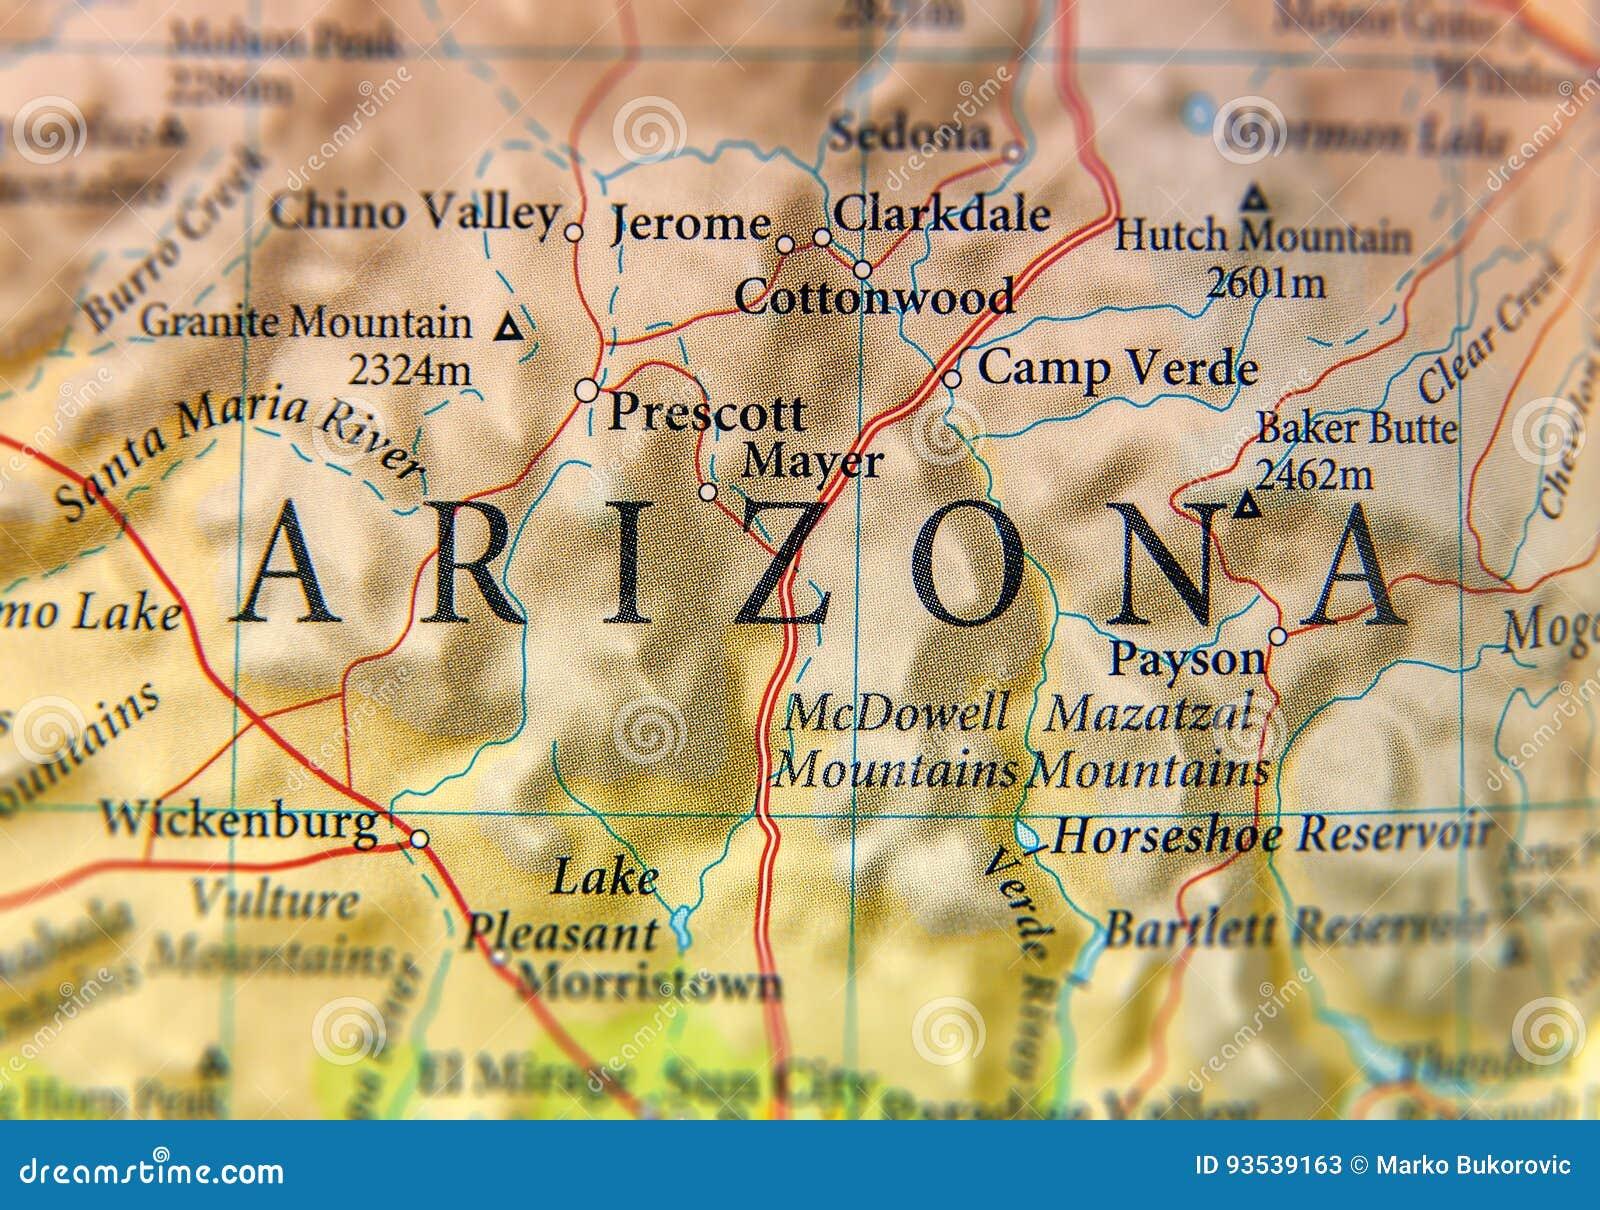 Tucson Arizona Karte.Geographische Karte Des Arizona Staatsabschlusses Stockbild